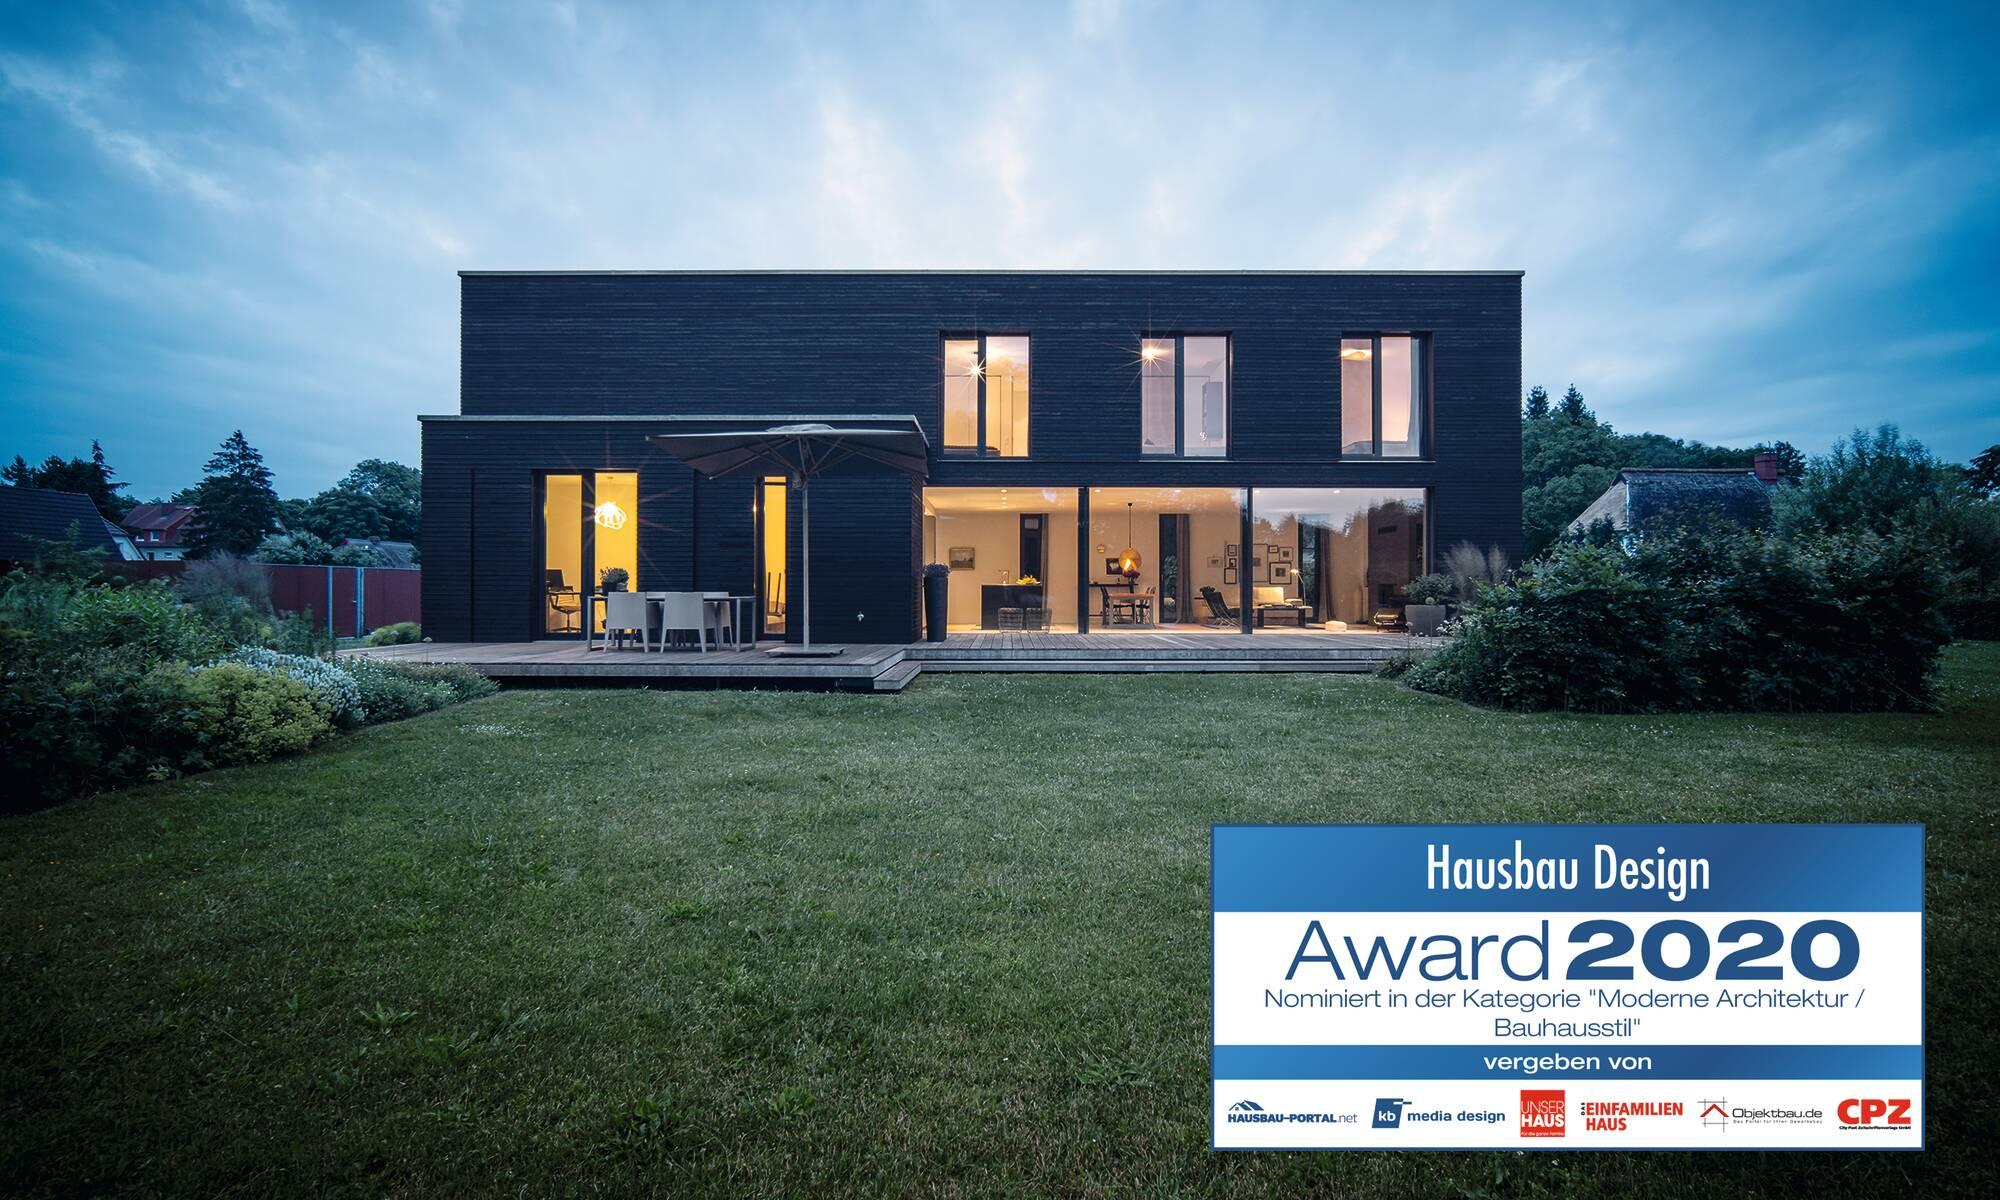 Hausbau Design Award 2020